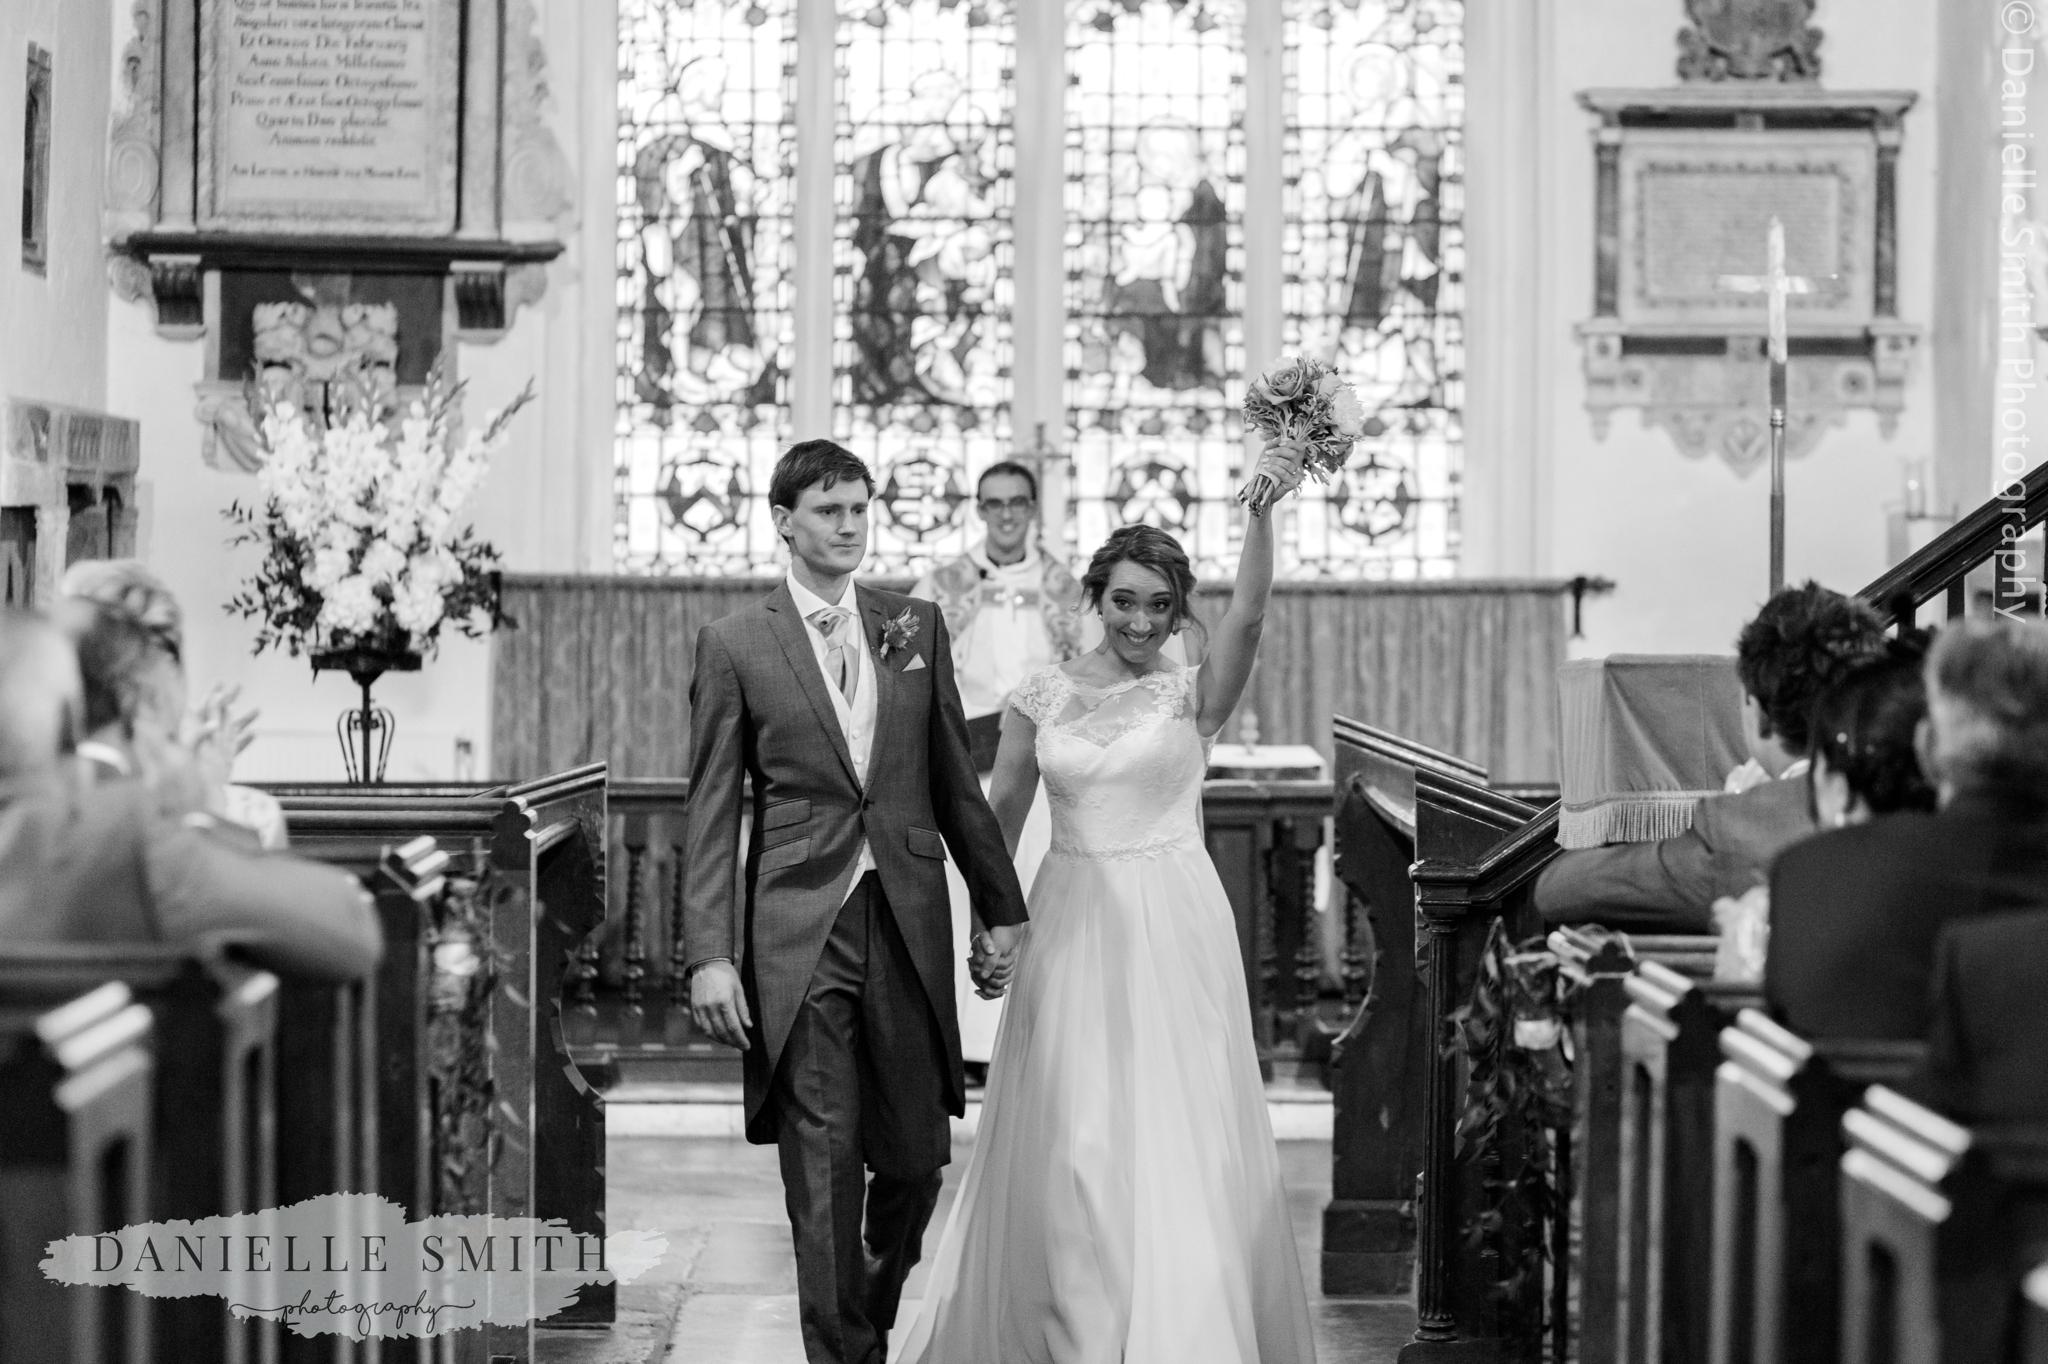 bride cheering as the walk down aisle